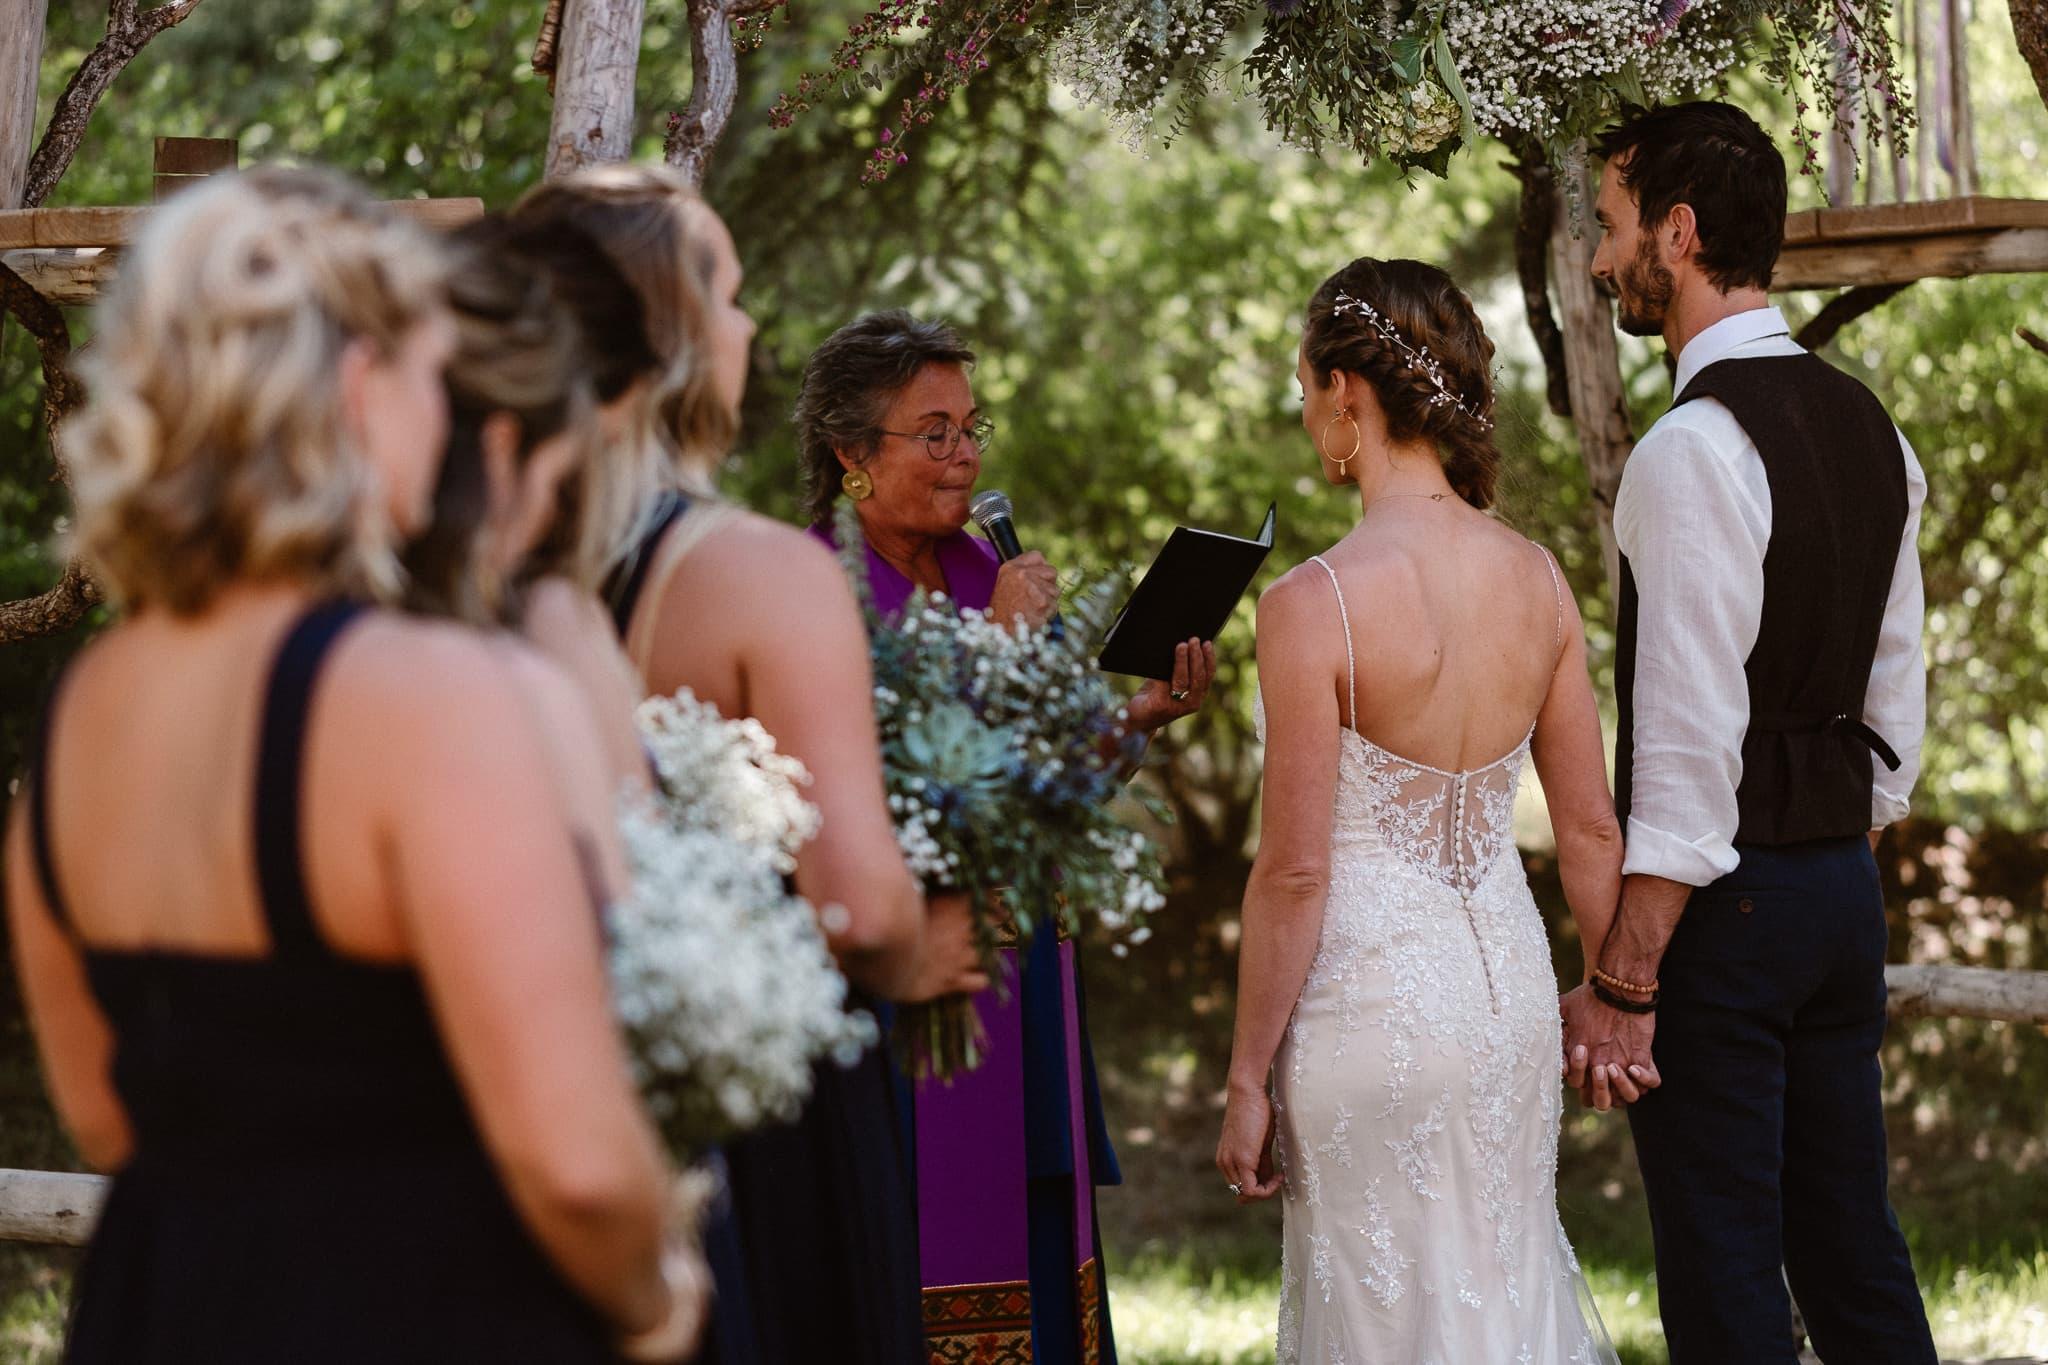 Redstone Inn wedding photographer, Carbondale wedding photographer, Colorado intimate wedding photographer, wedding ceremony